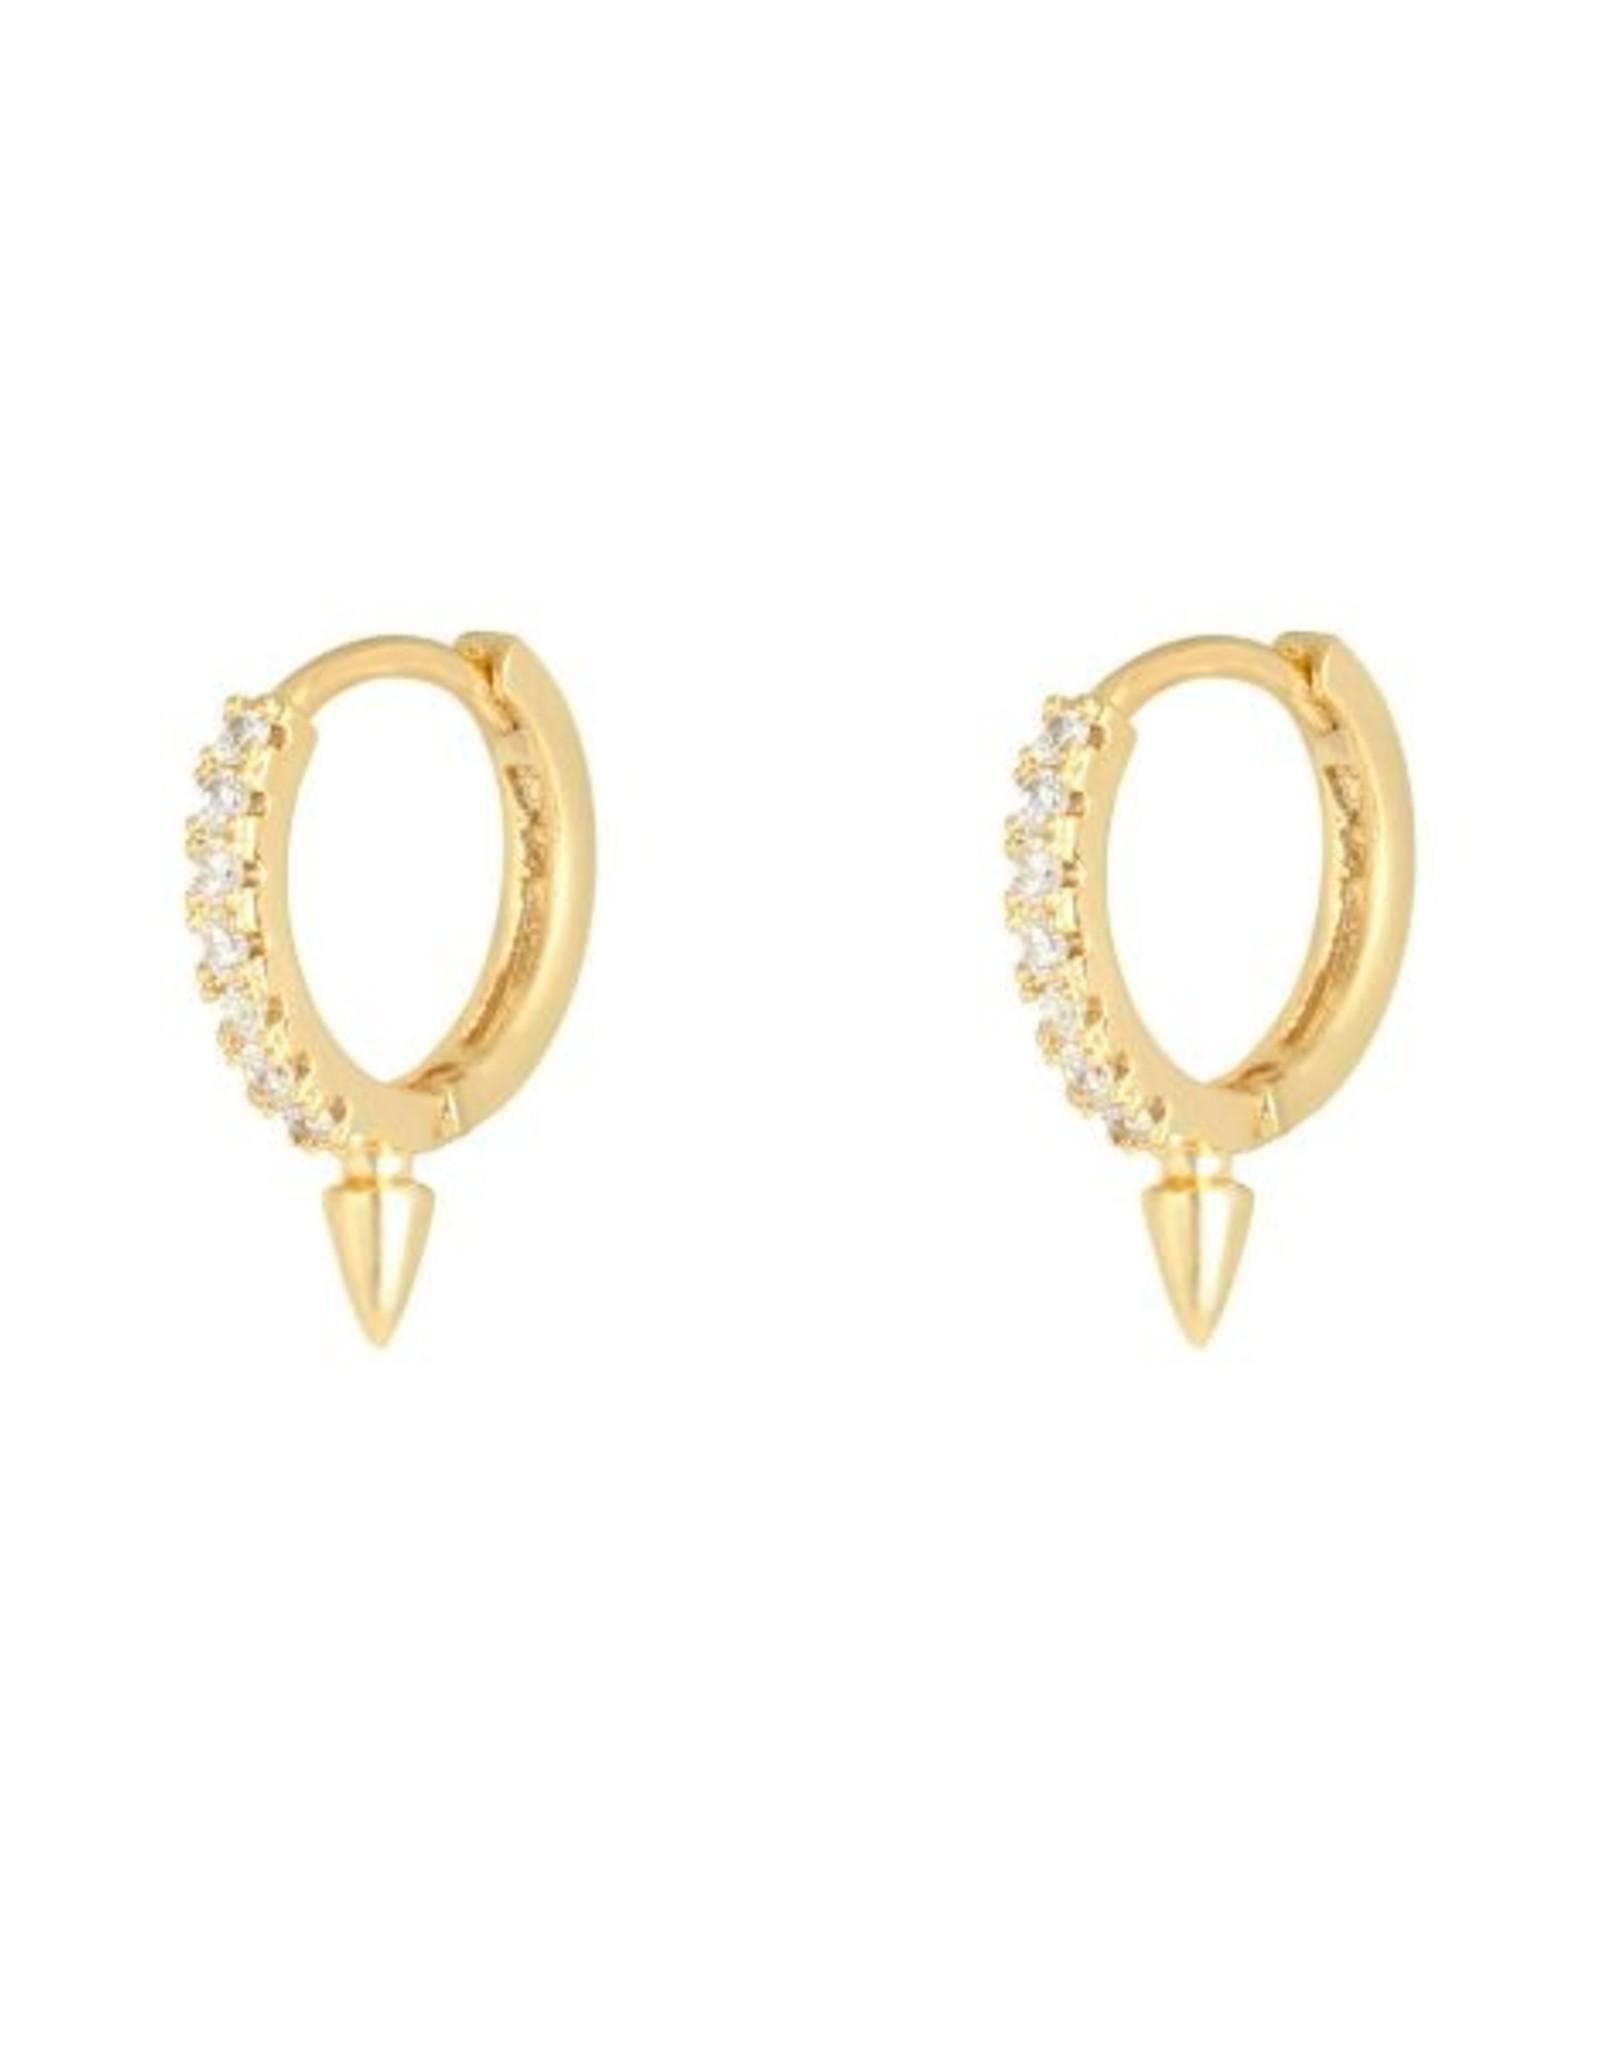 Earrings spike & stones gold